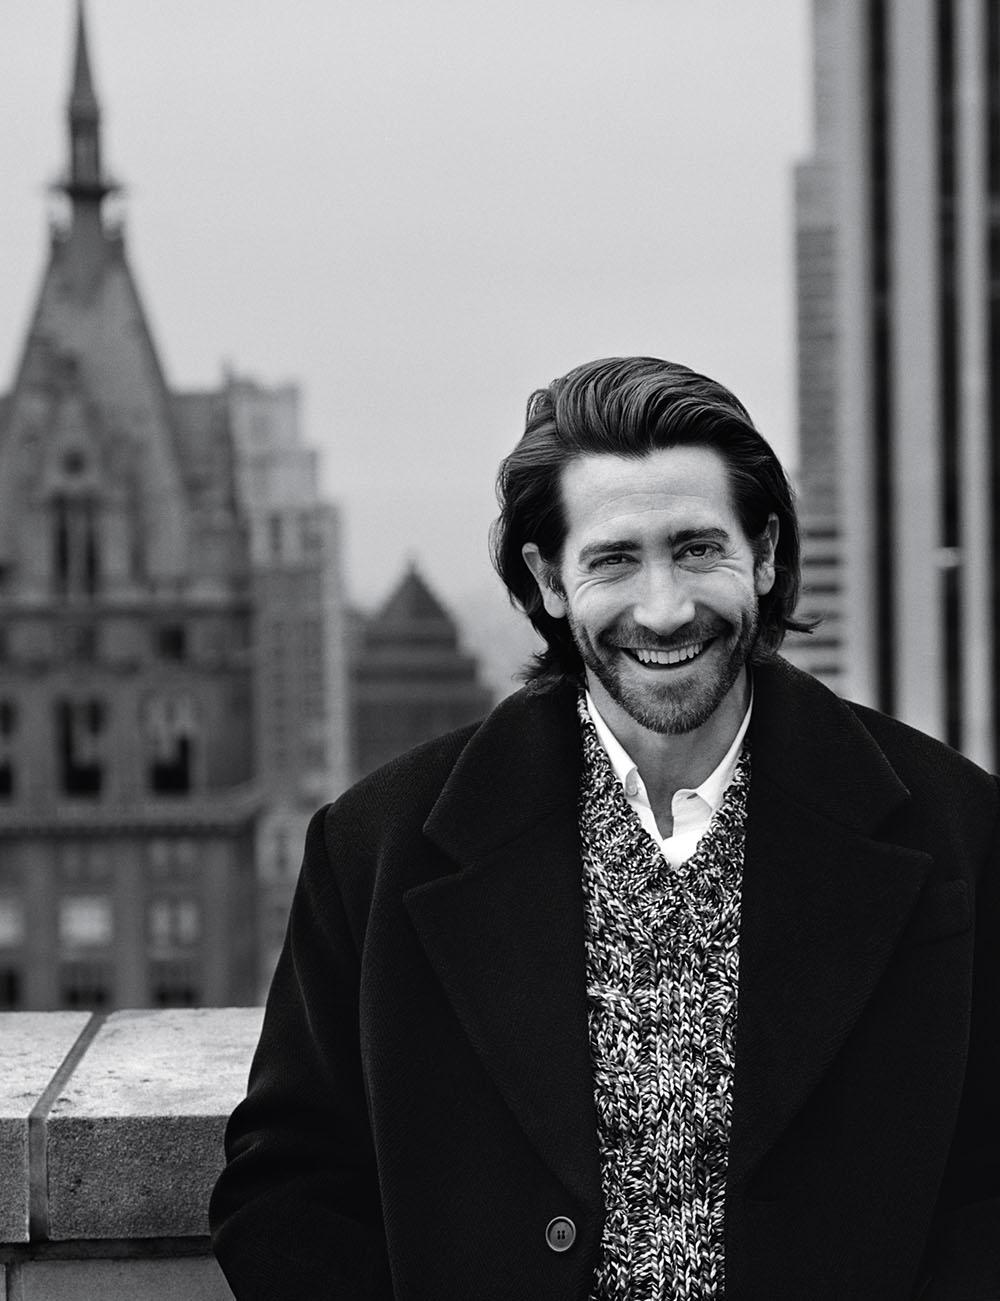 Jake Gyllenhaal covers AnOther Man Summer Autumn 2020 by Alasdair McLellan